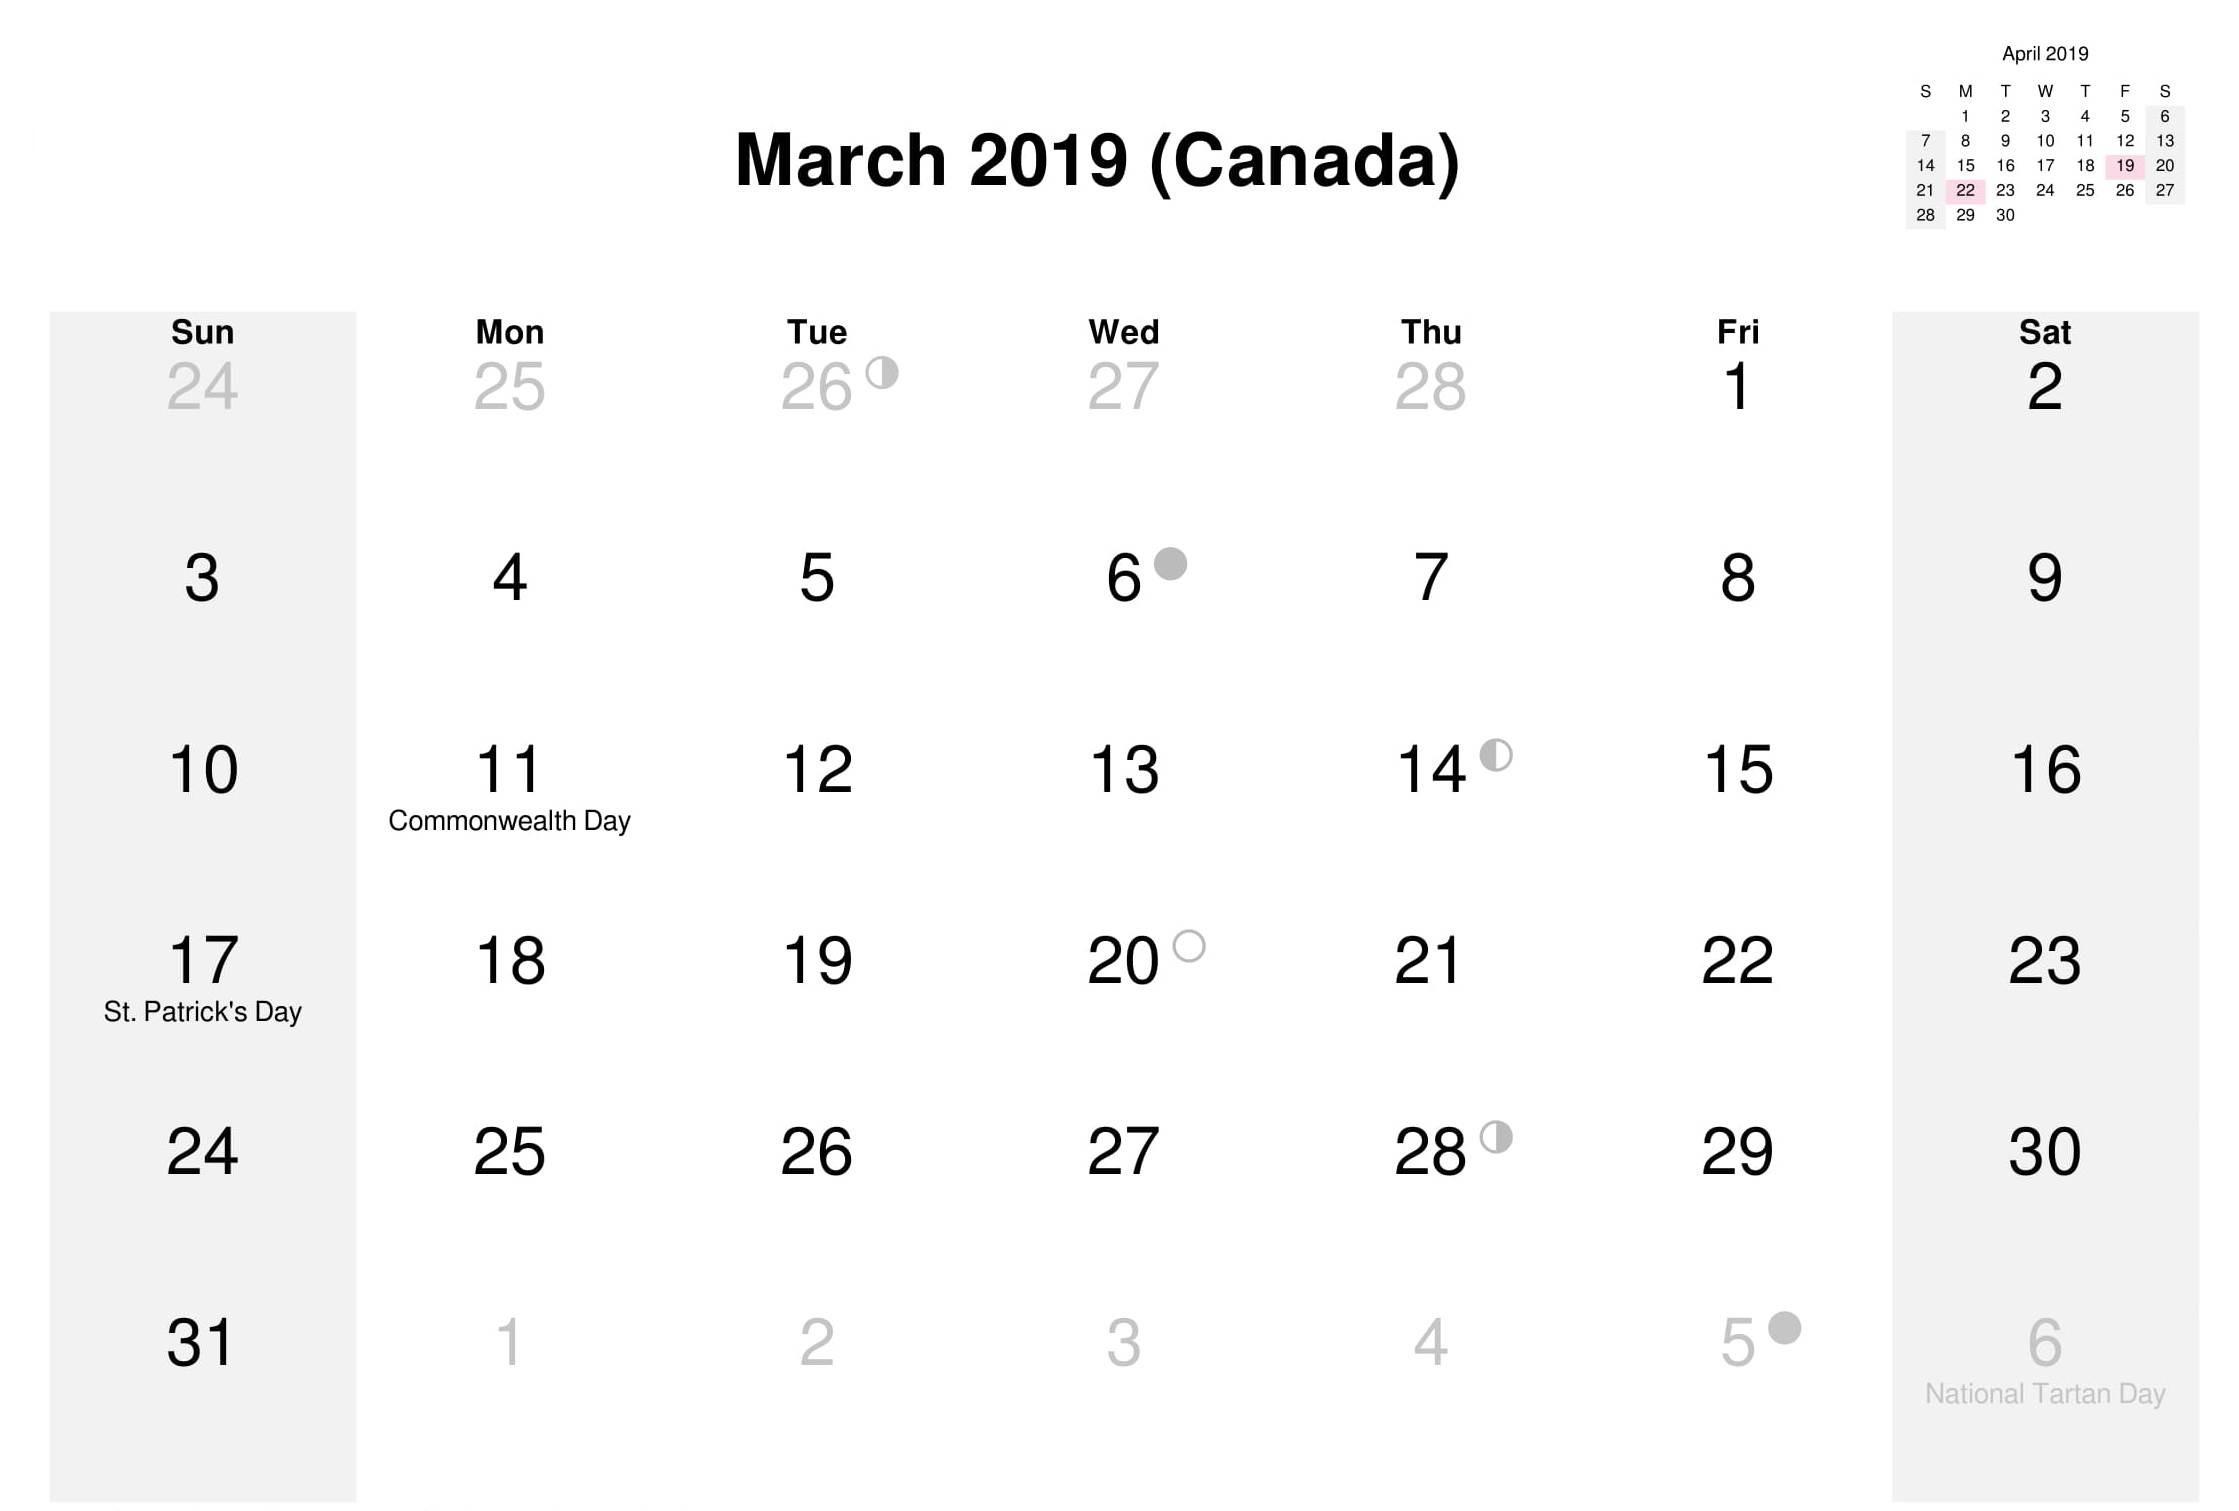 Calendar for March 2019 Canada